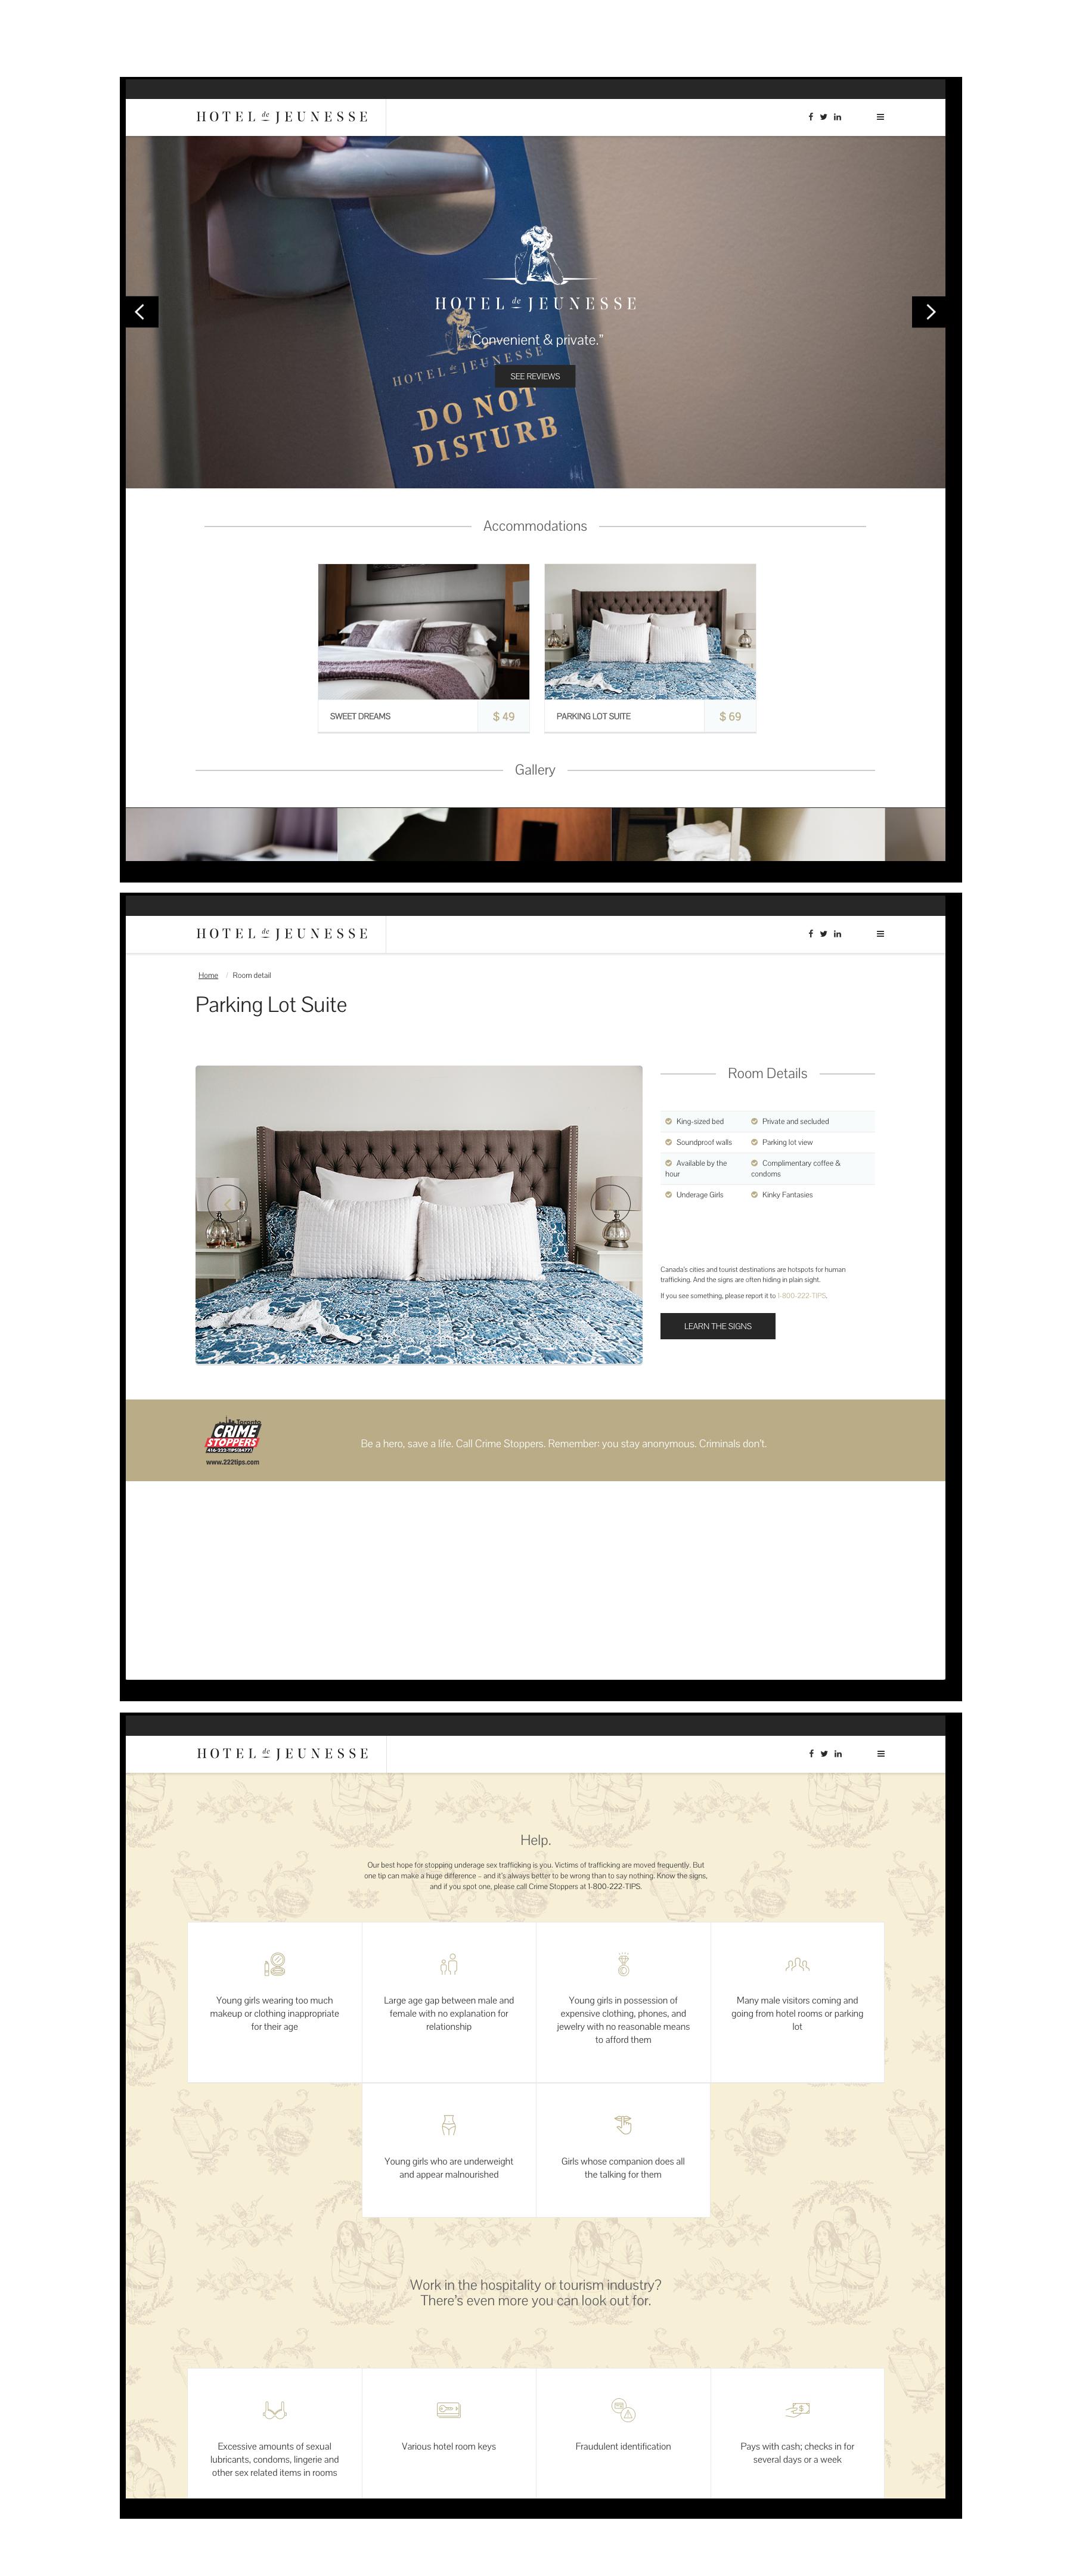 Marlee-Maclean_Crime-Stoppers_Hotel-De-Jeunesse_Screenshots.png